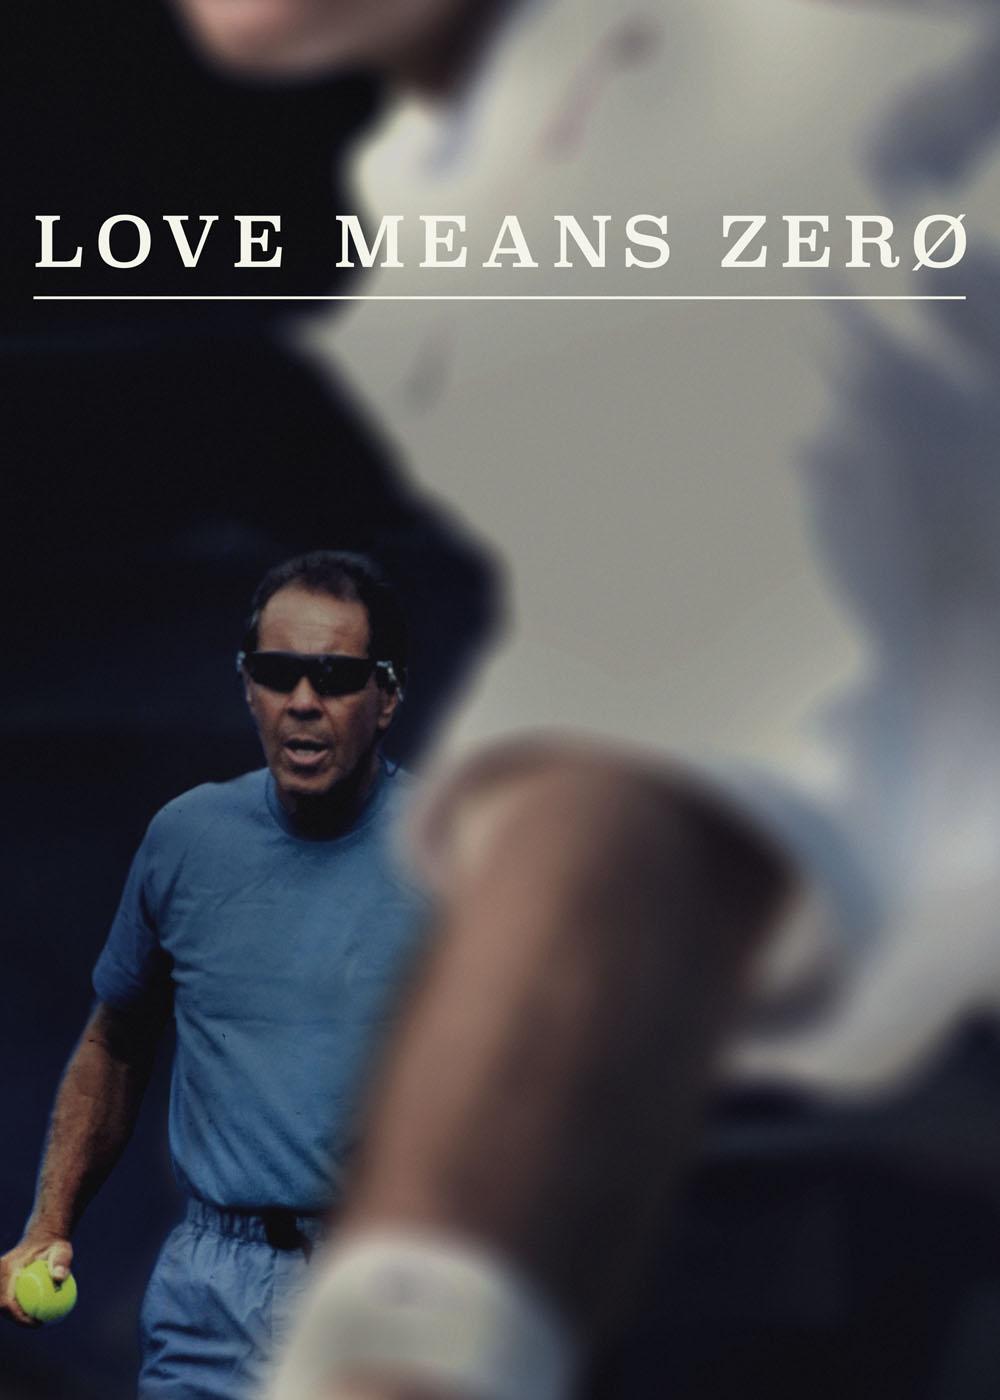 lovemeanszero_poster.jpg